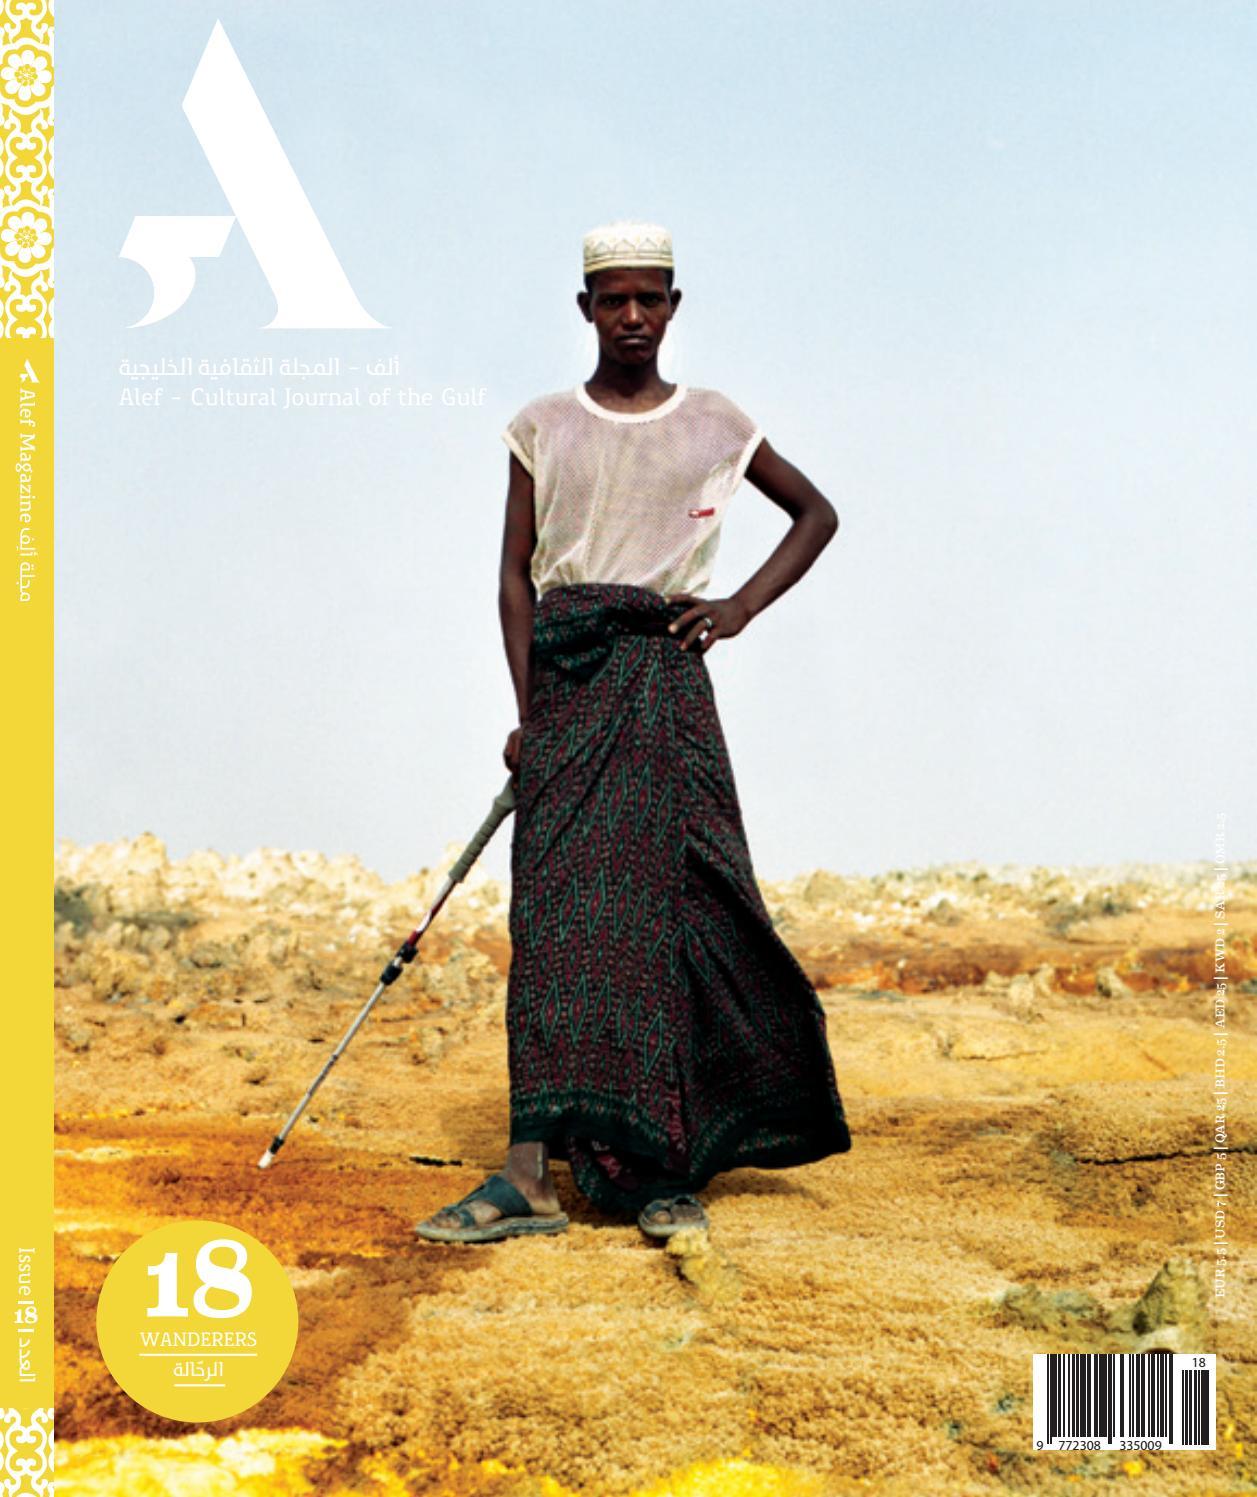 e7f14e4ce Alef magazine #18 by Alef Magazine - issuu